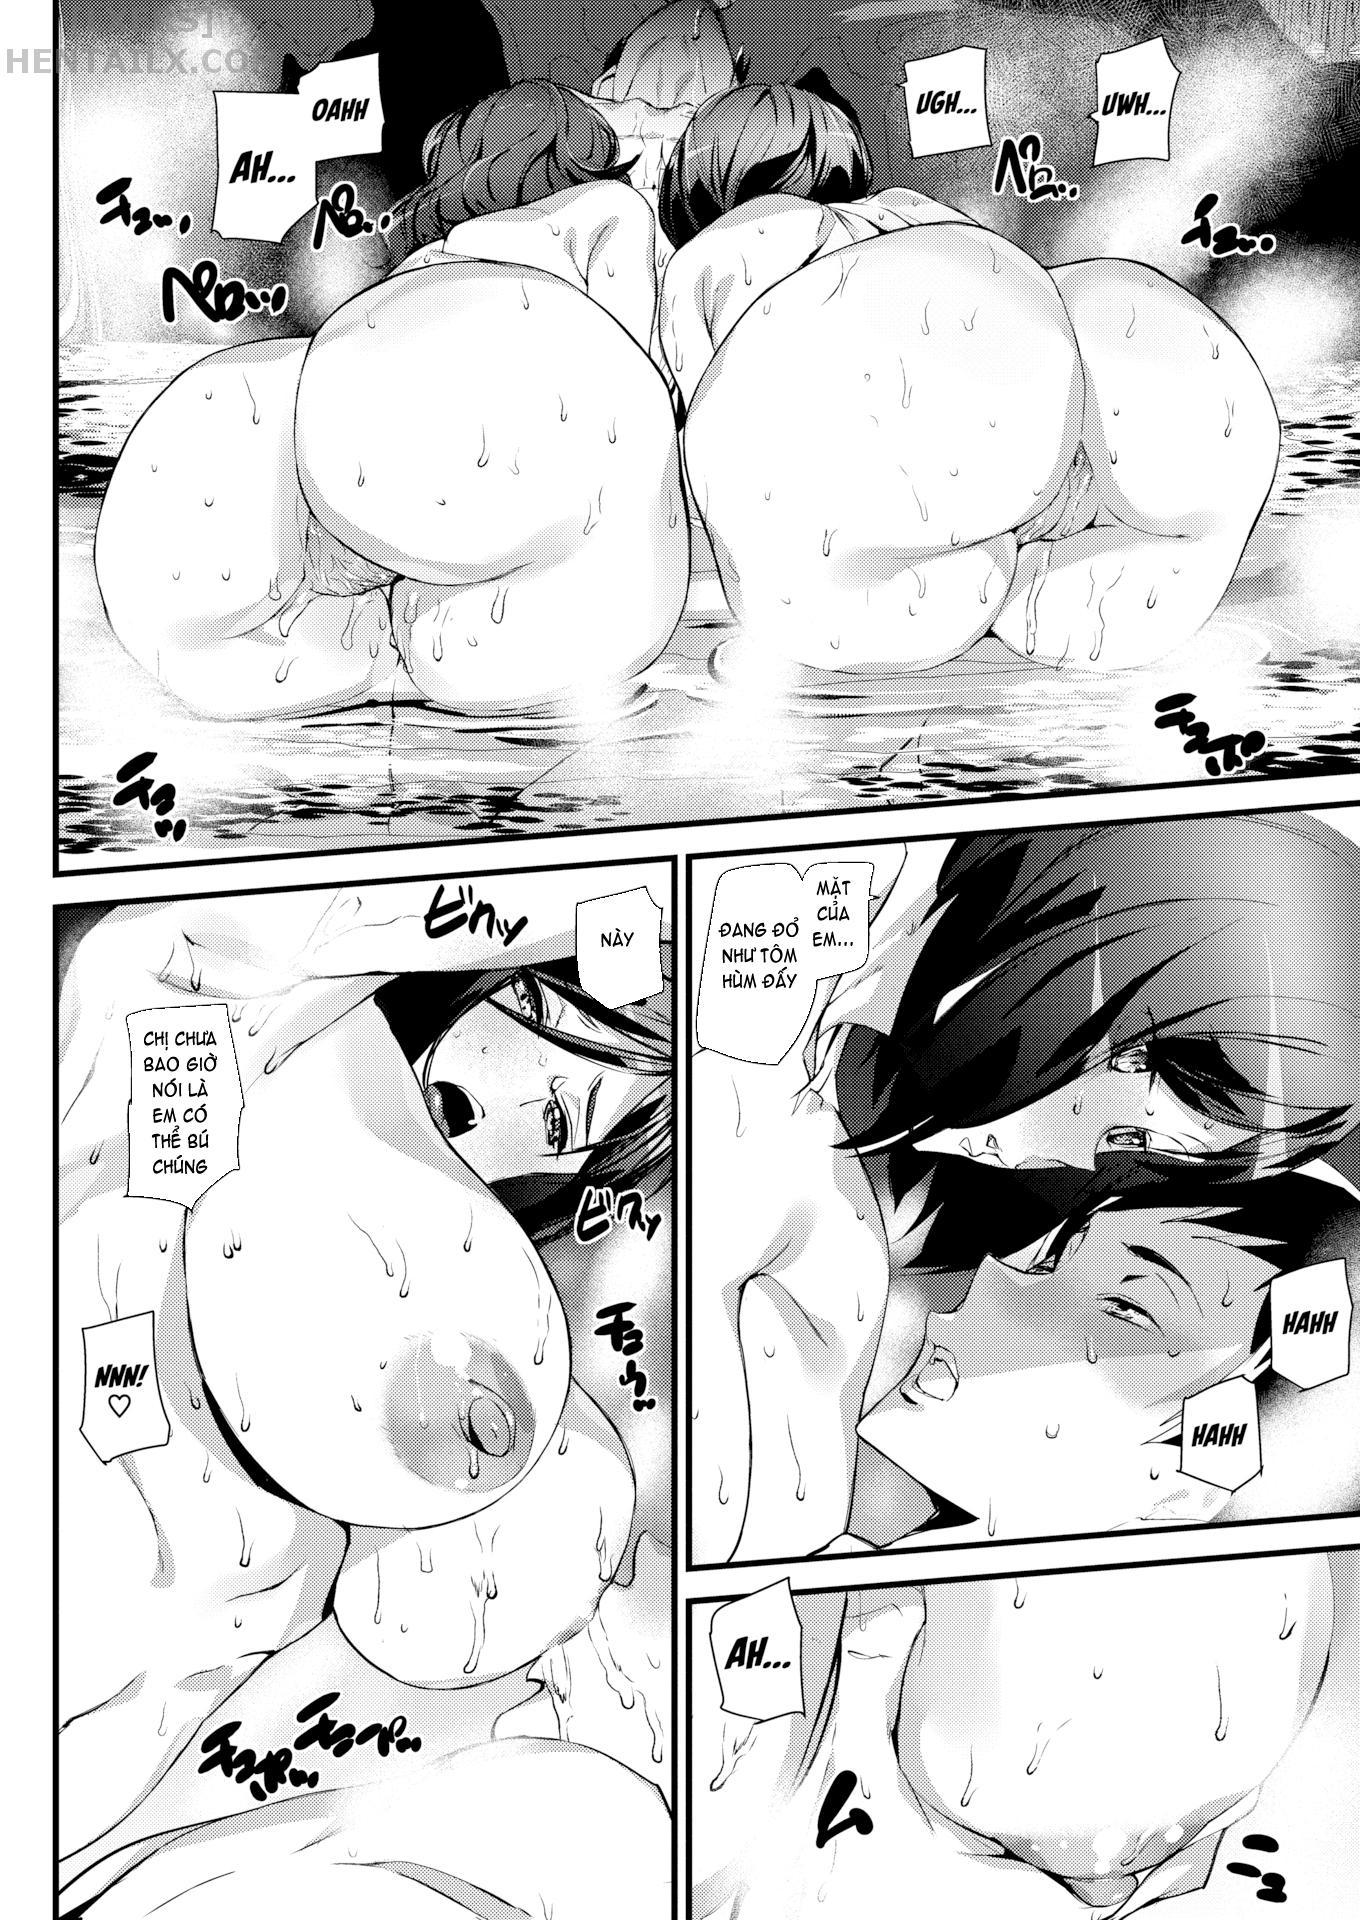 012 Hot Trip  - hentaicube.net - Truyện tranh hentai online